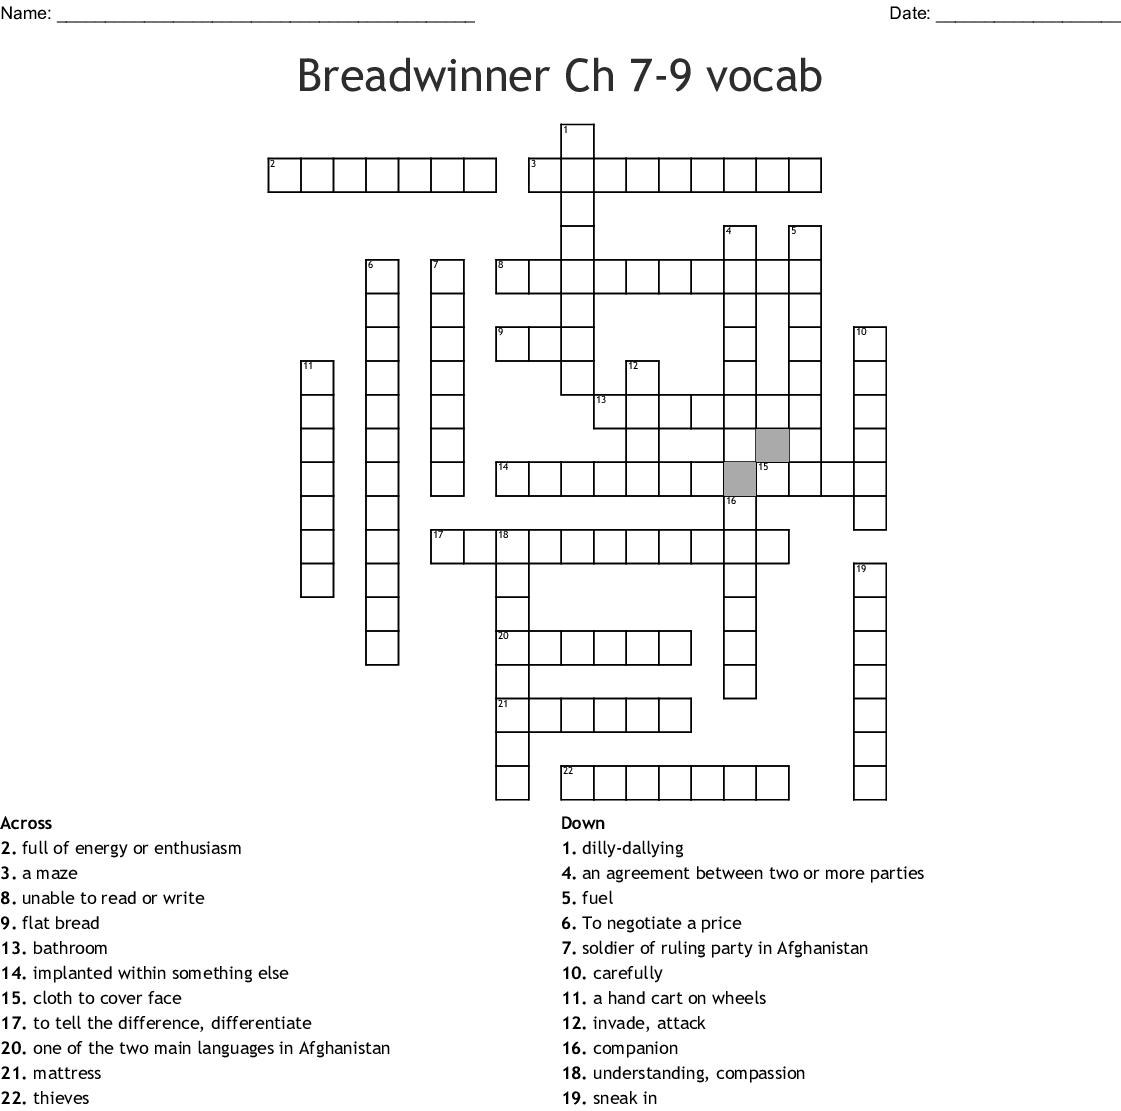 Breadwinner Ch 7 9 Vocab Crossword Wordmint